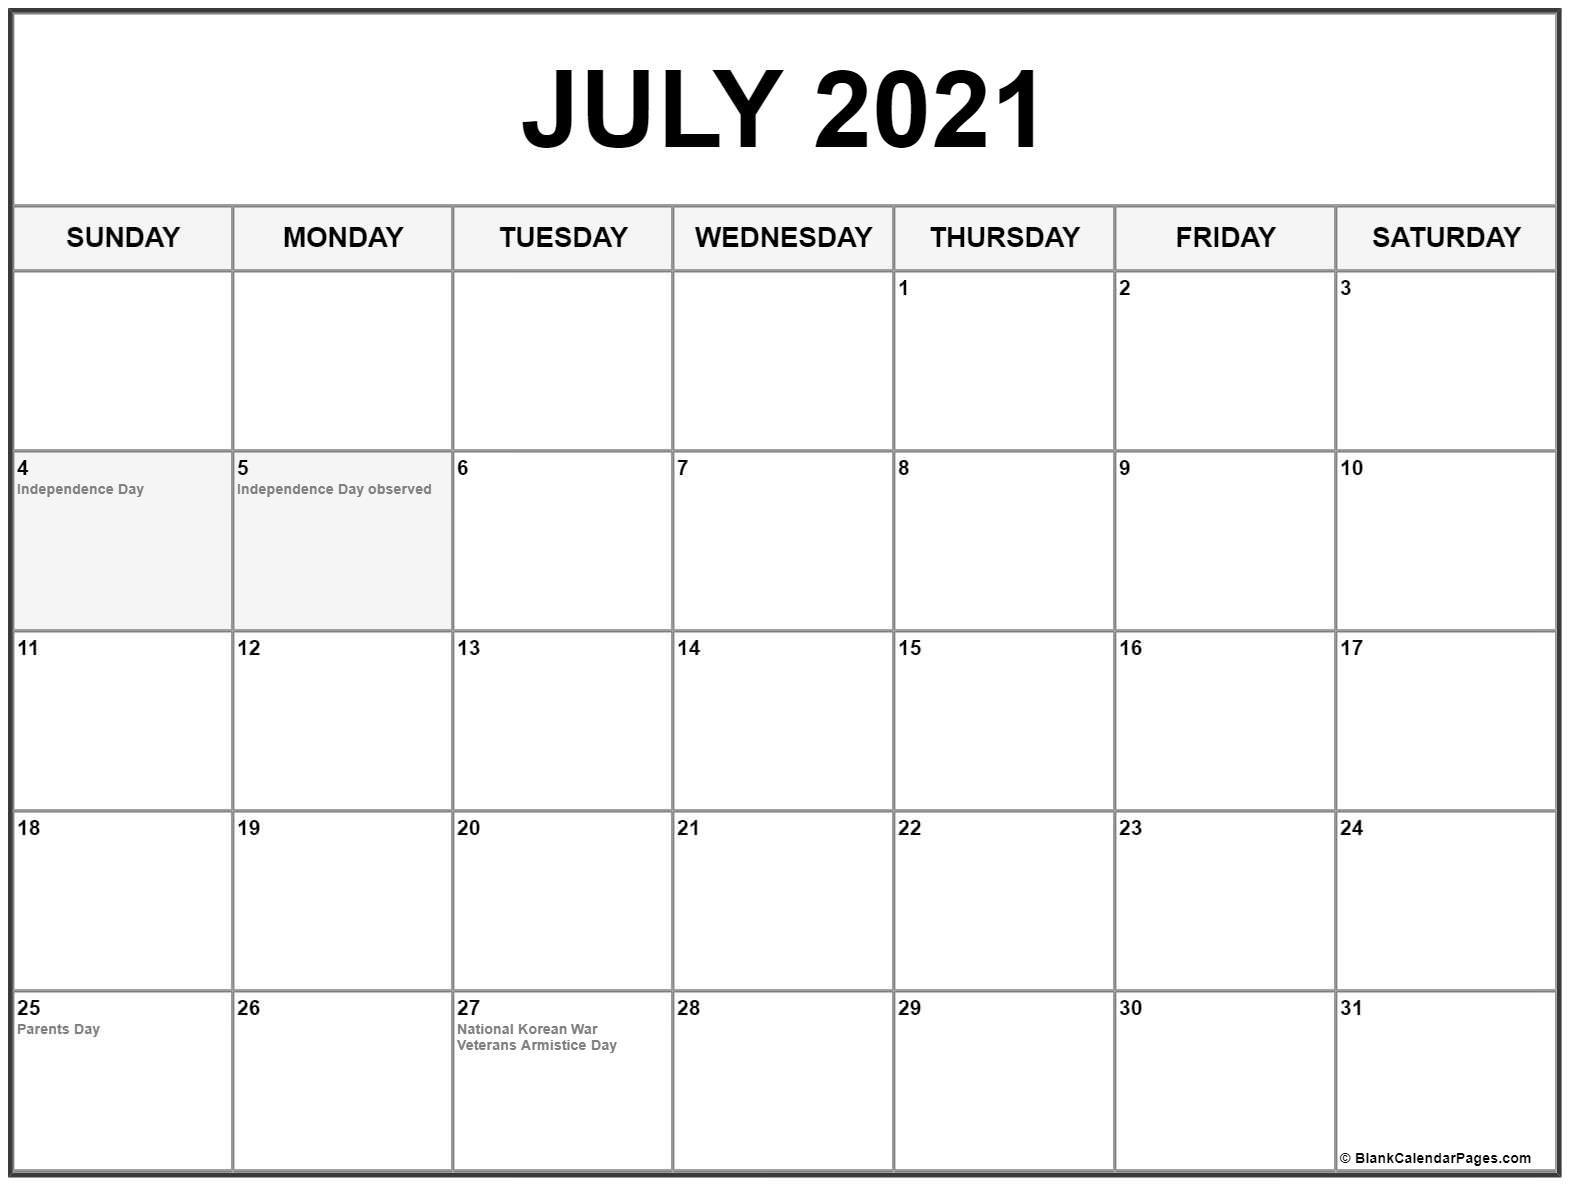 July 2021 Calendar With Holidays - Calendar 2021 July 2021 Calendar Vertical